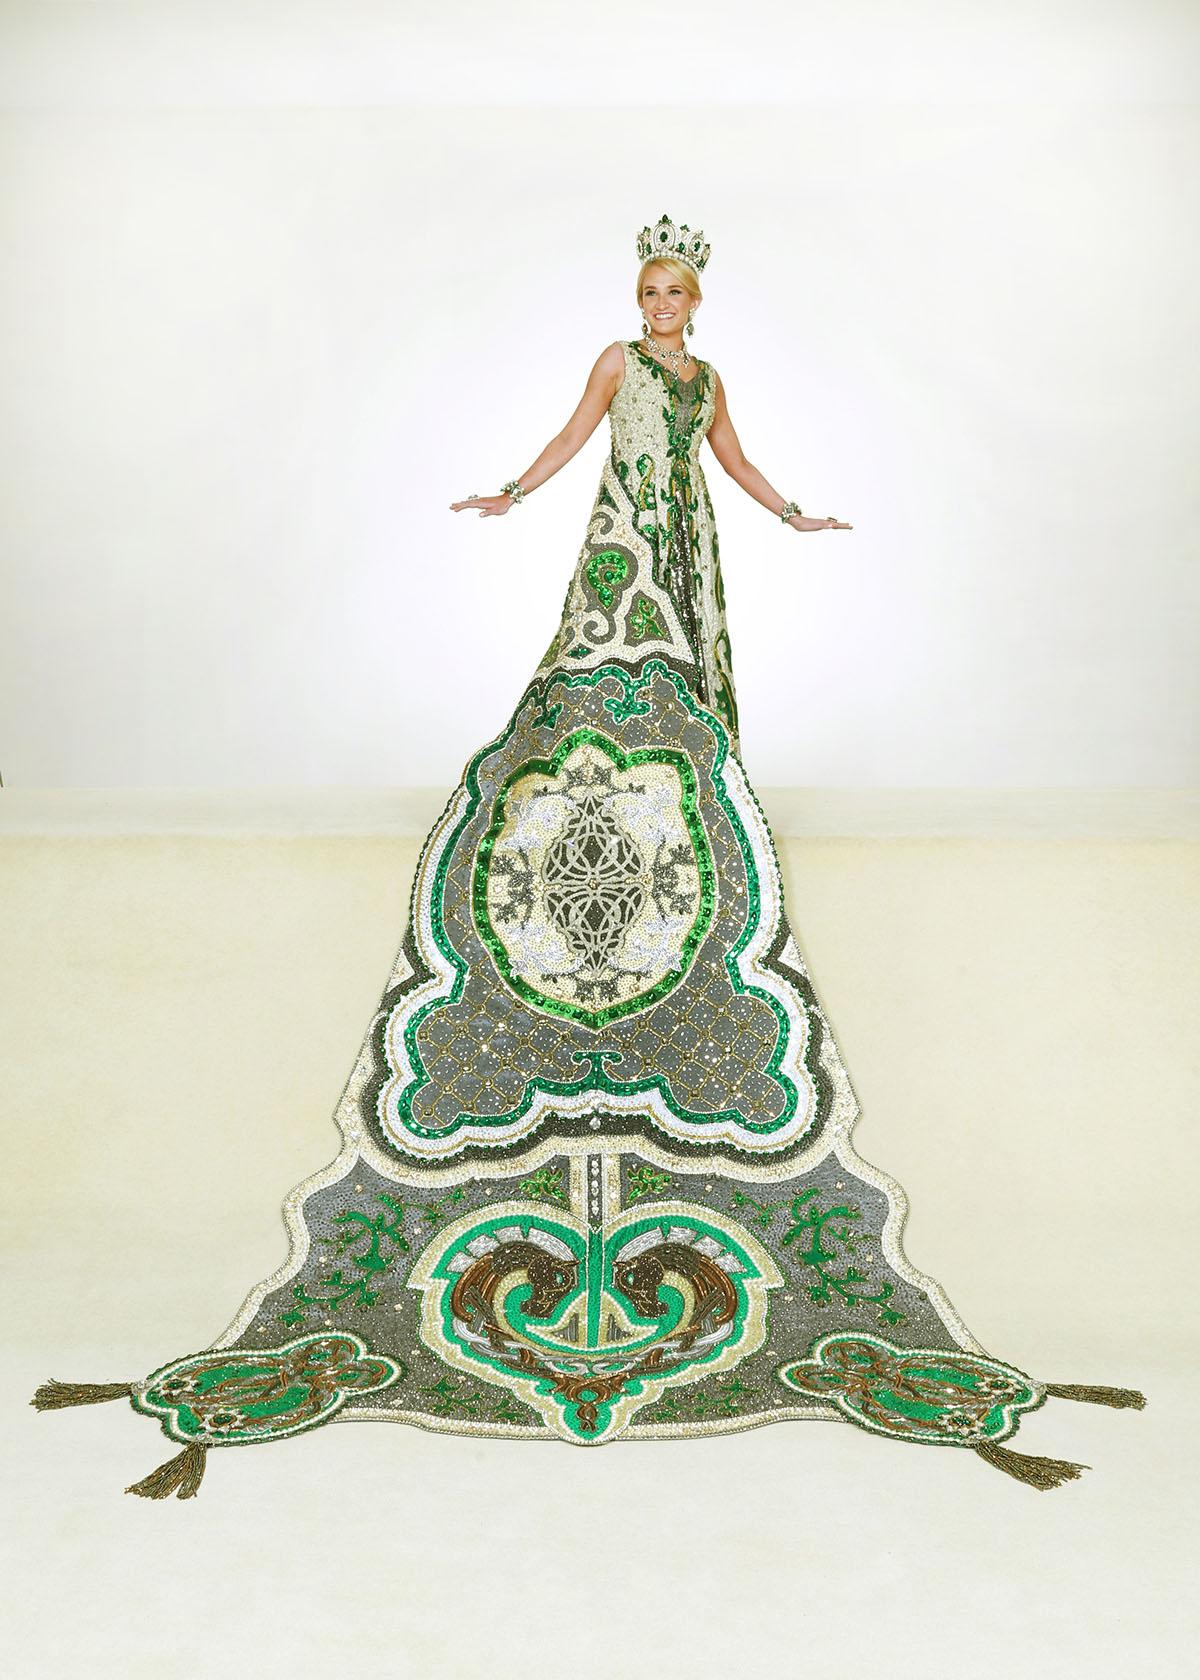 Caroline Green, Duchess Of Epic Journeys